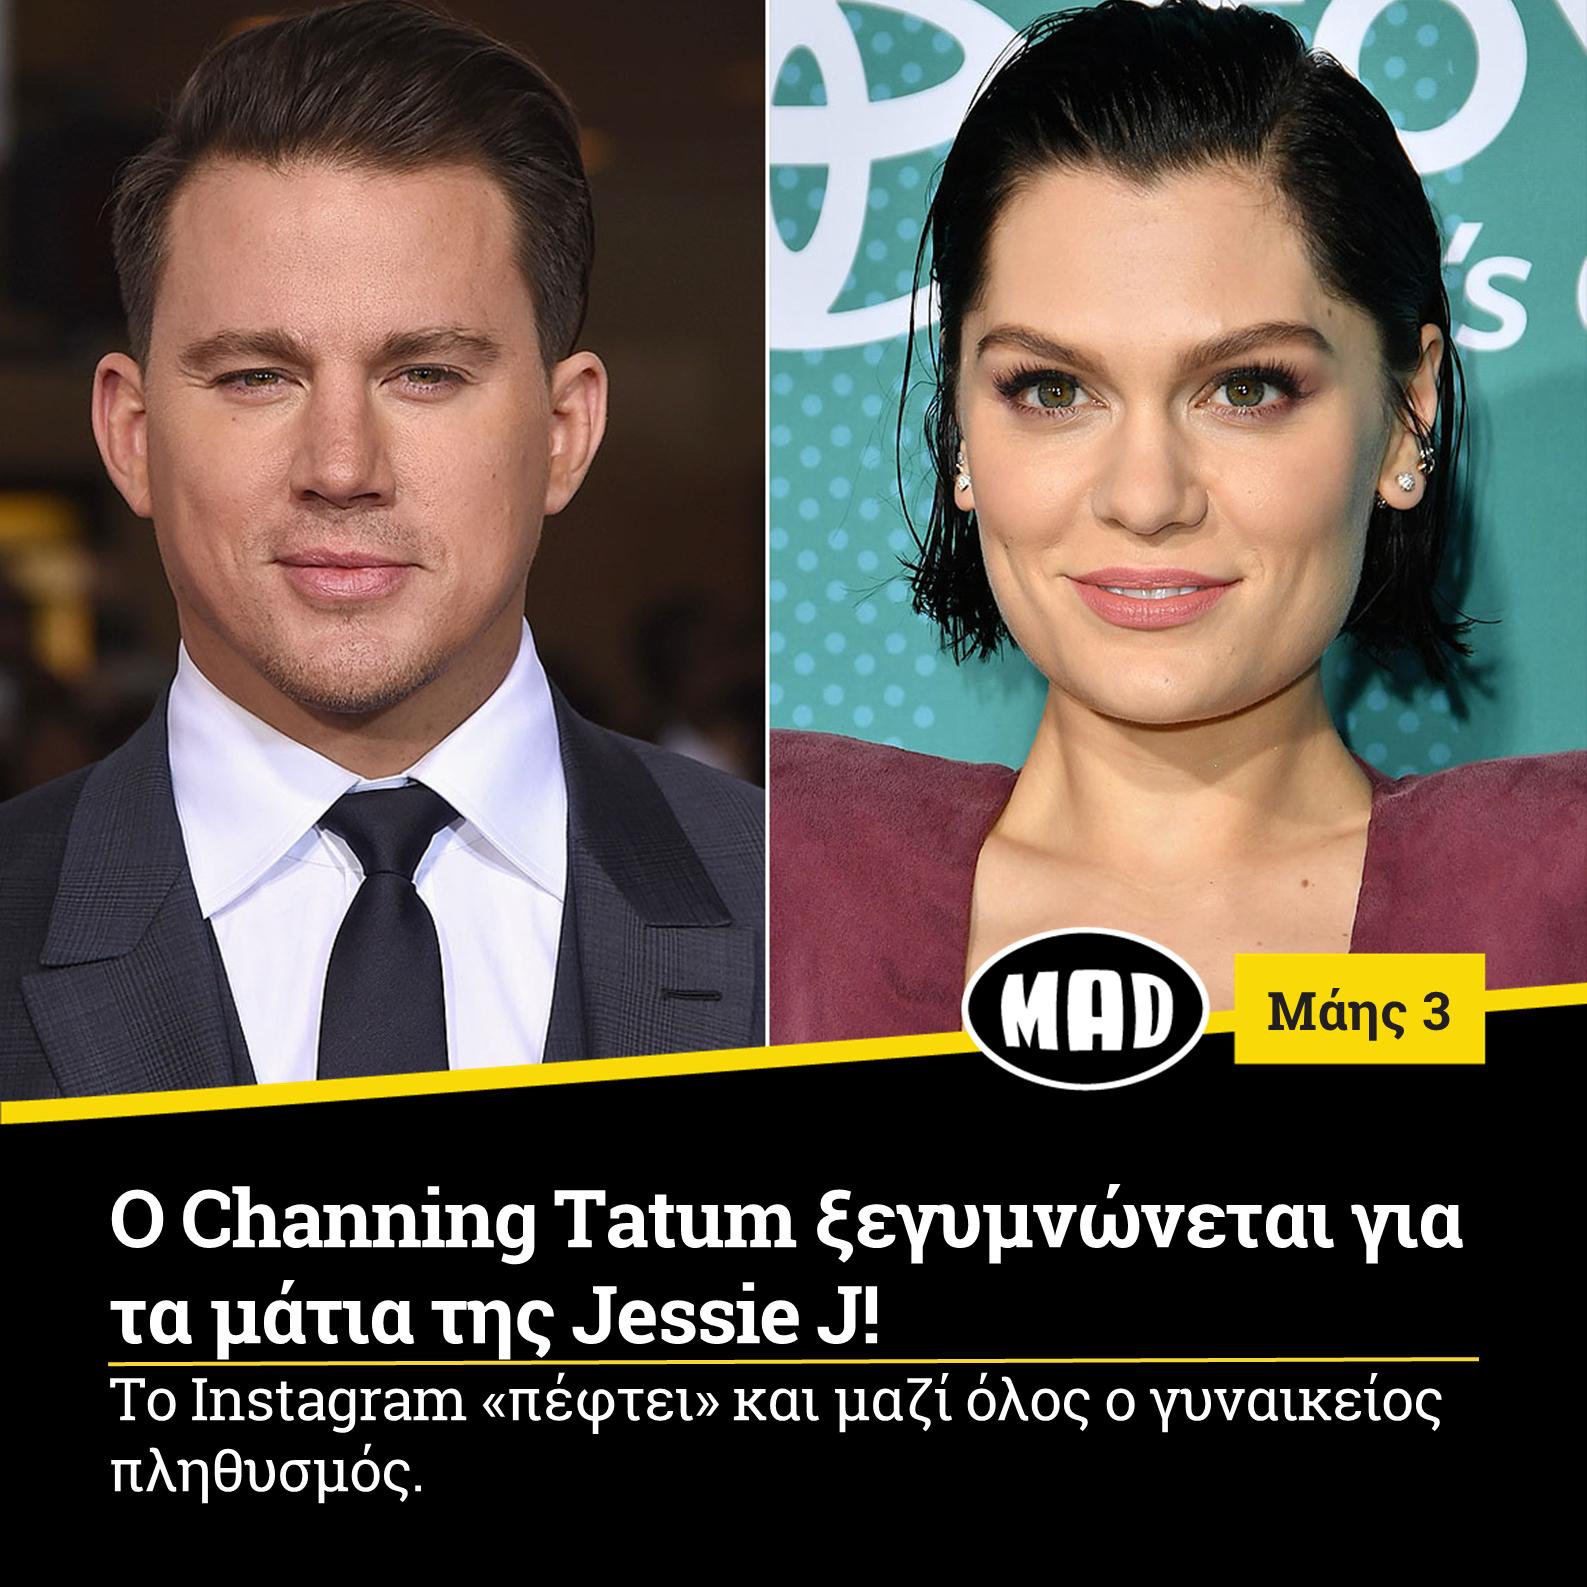 O Channing Tatum ξεγυμνώνεται για τα μάτια της Jessie J!